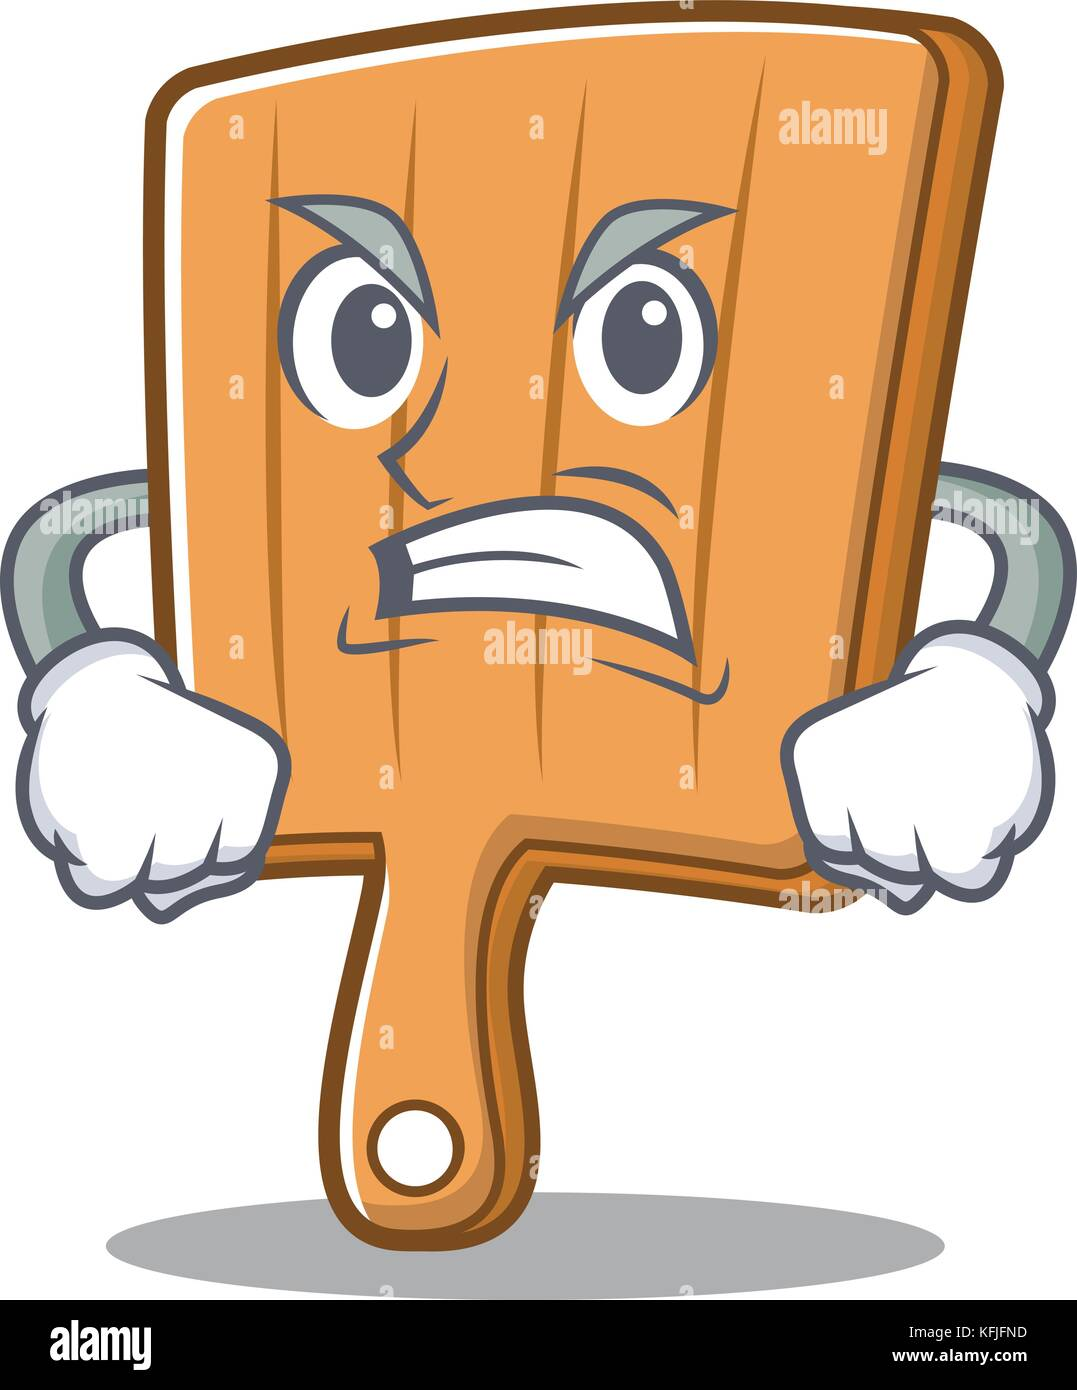 Wütend Küche bord Charakter Cartoon Vektor Abbildung - Bild ...